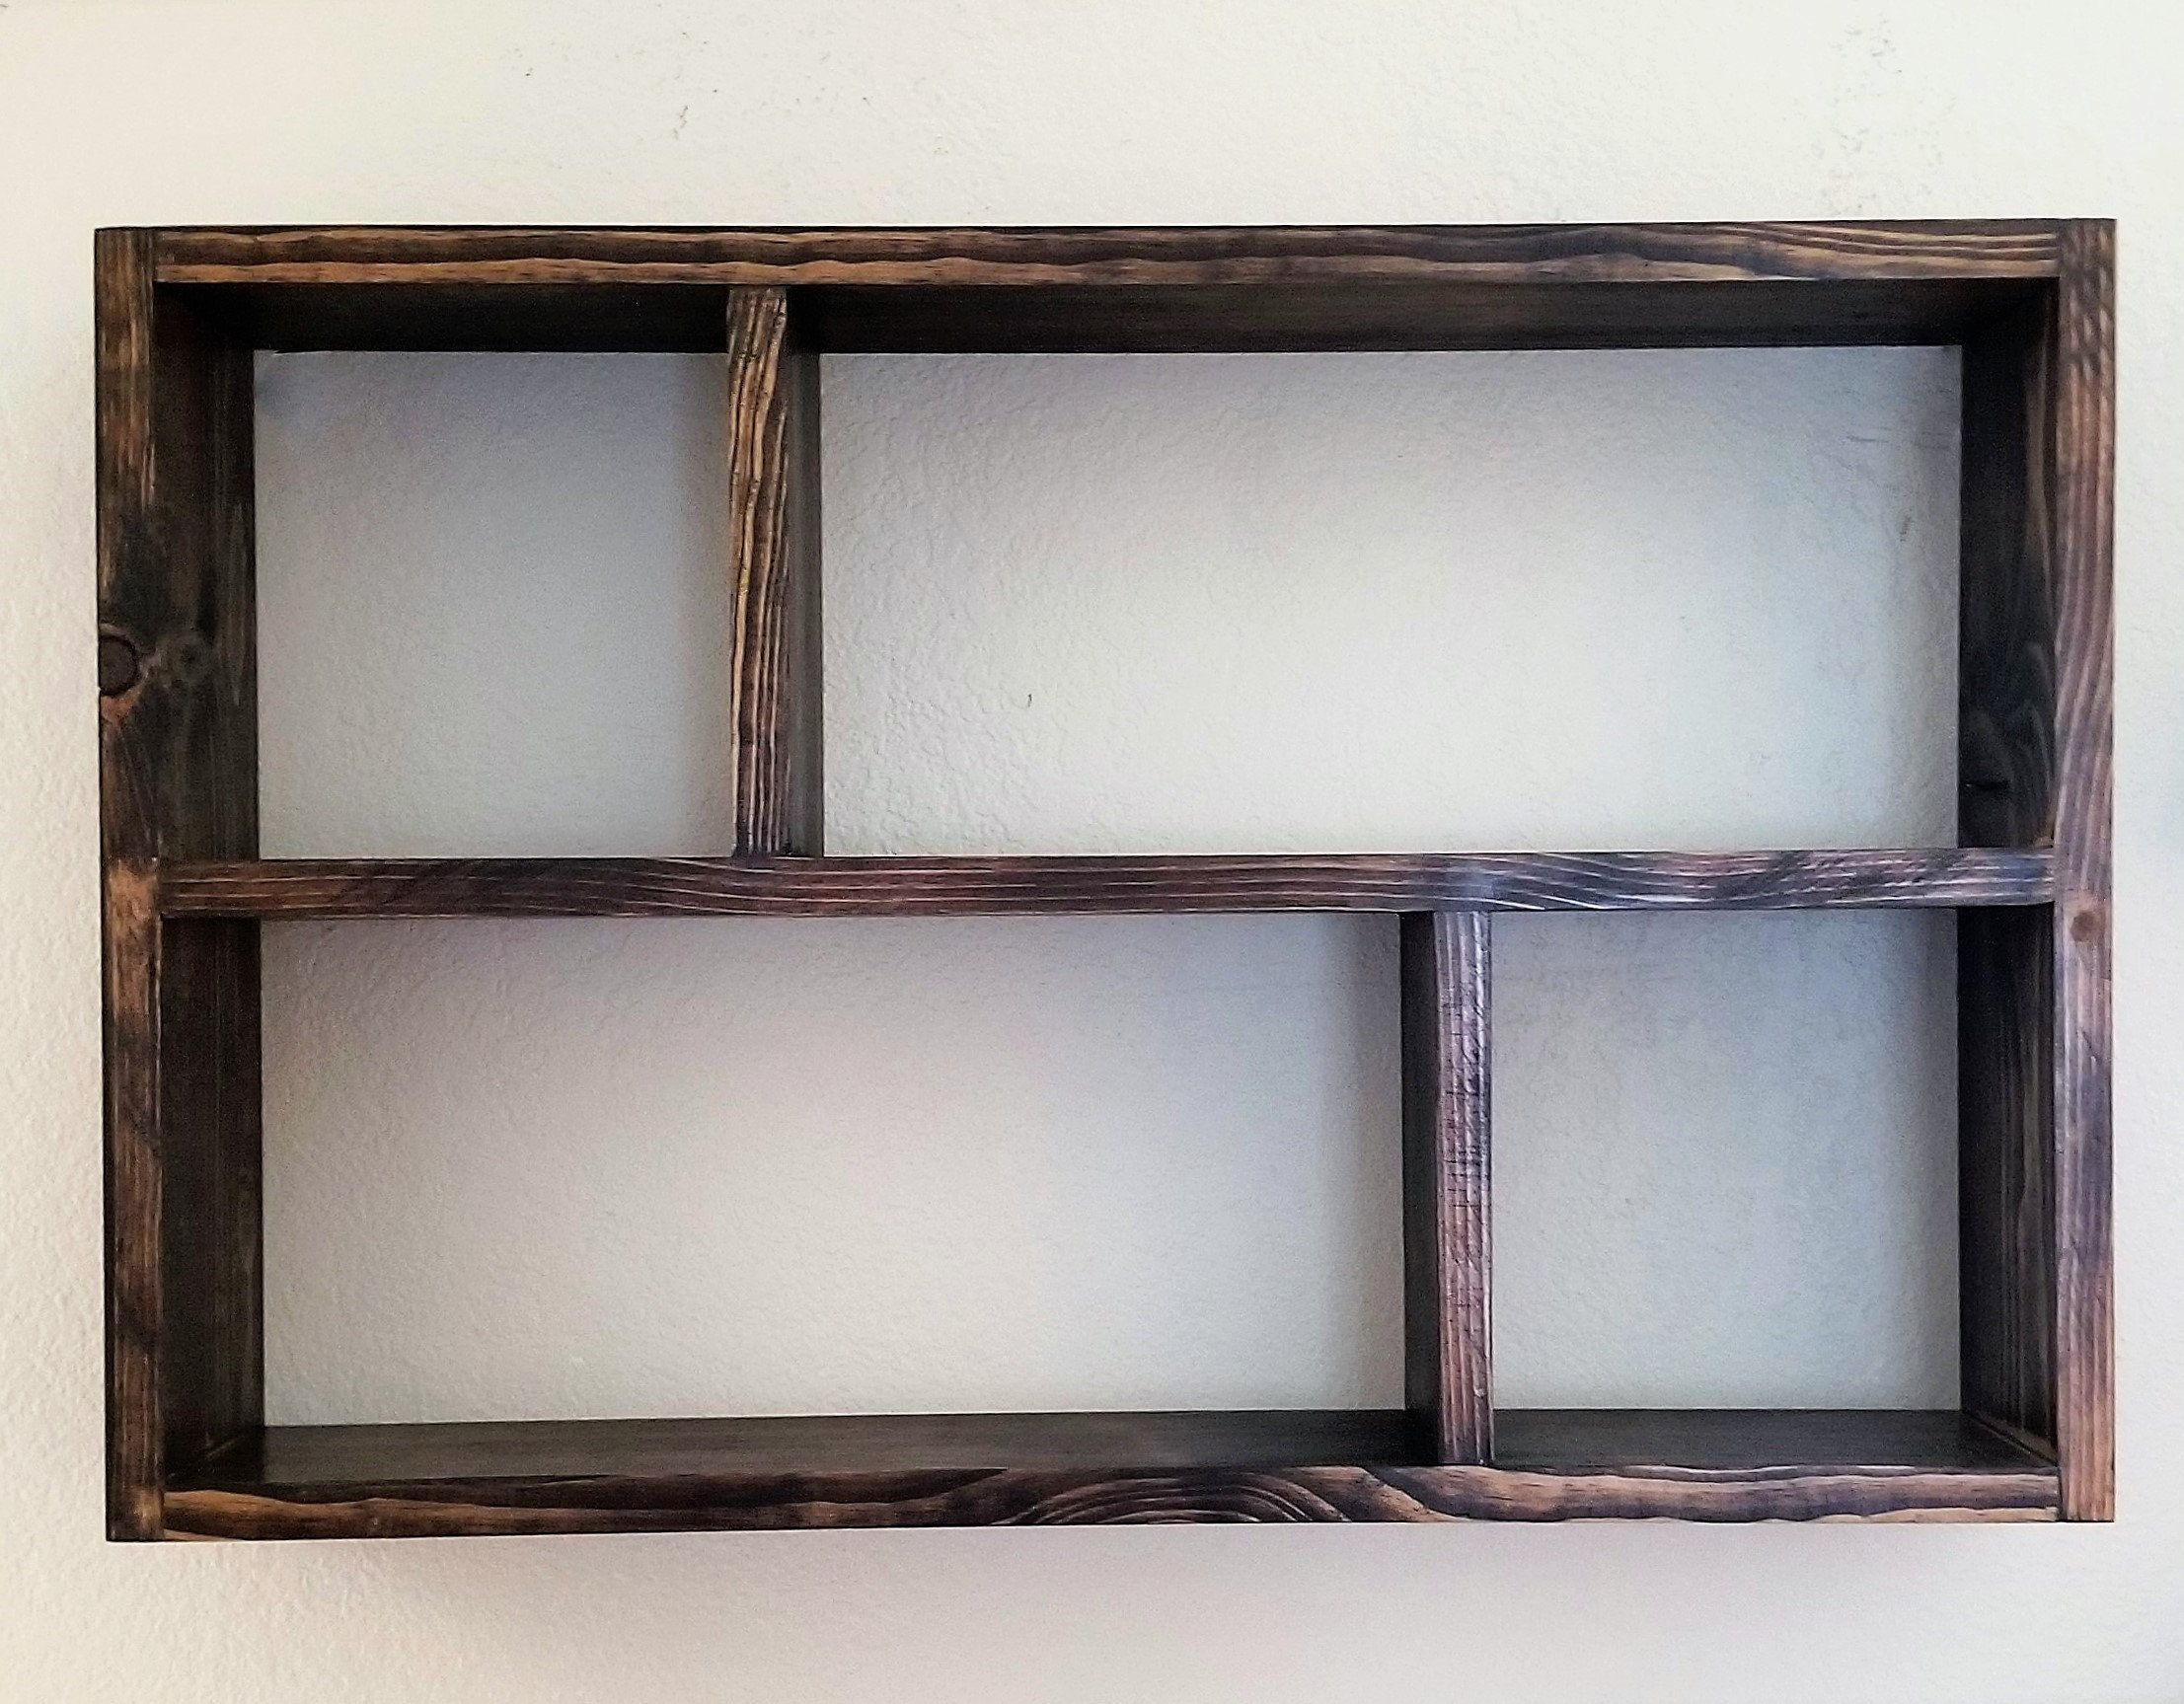 Wall Shelves Shadow Box Display